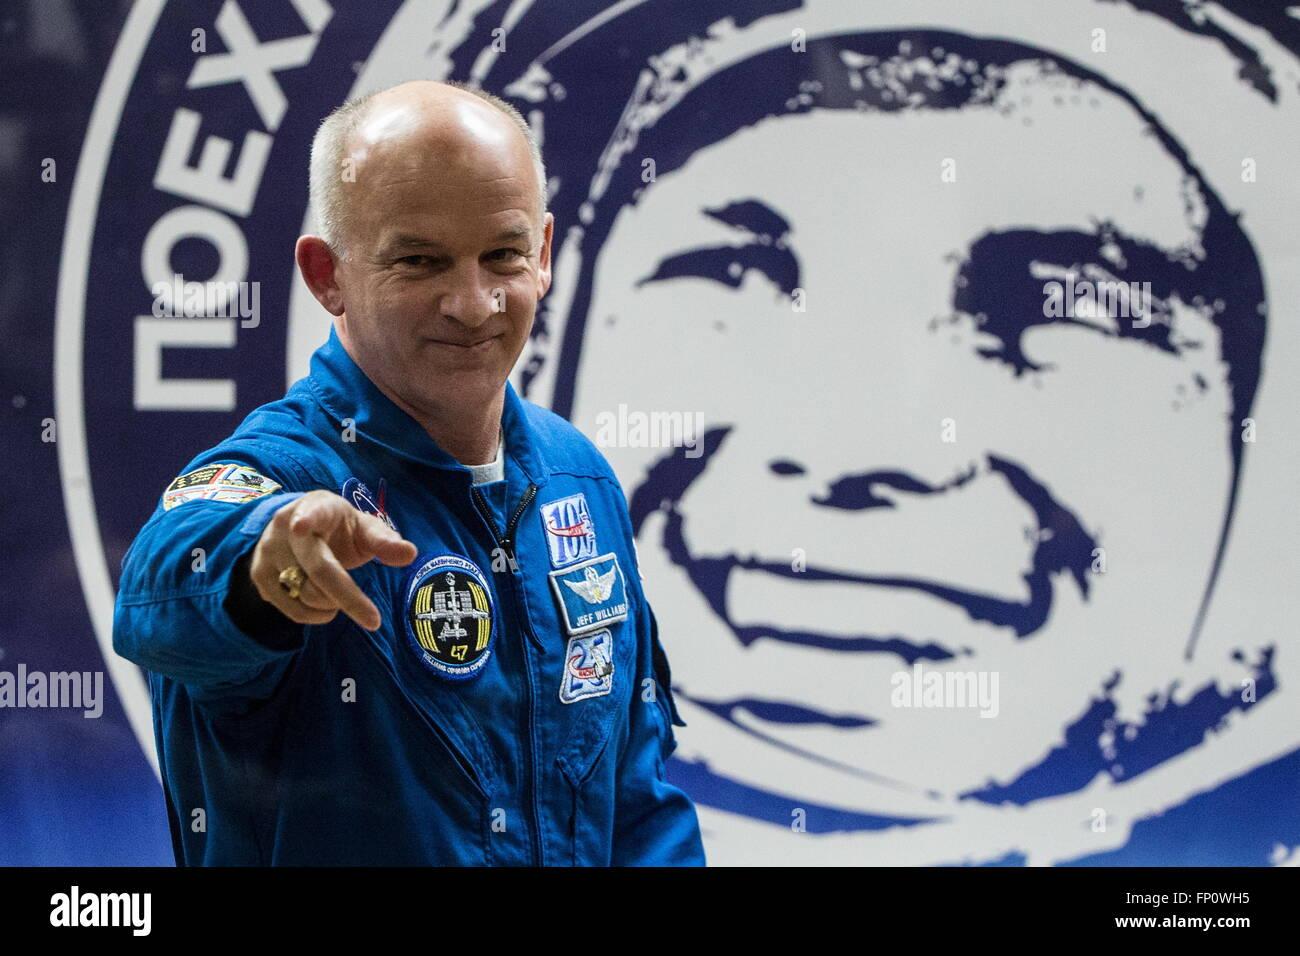 Baikonur, Kazakhstan. 17th Mar, 2016. International Space Station Expedition 47/48 main crew member, astronaut Jeffrey - Stock Image